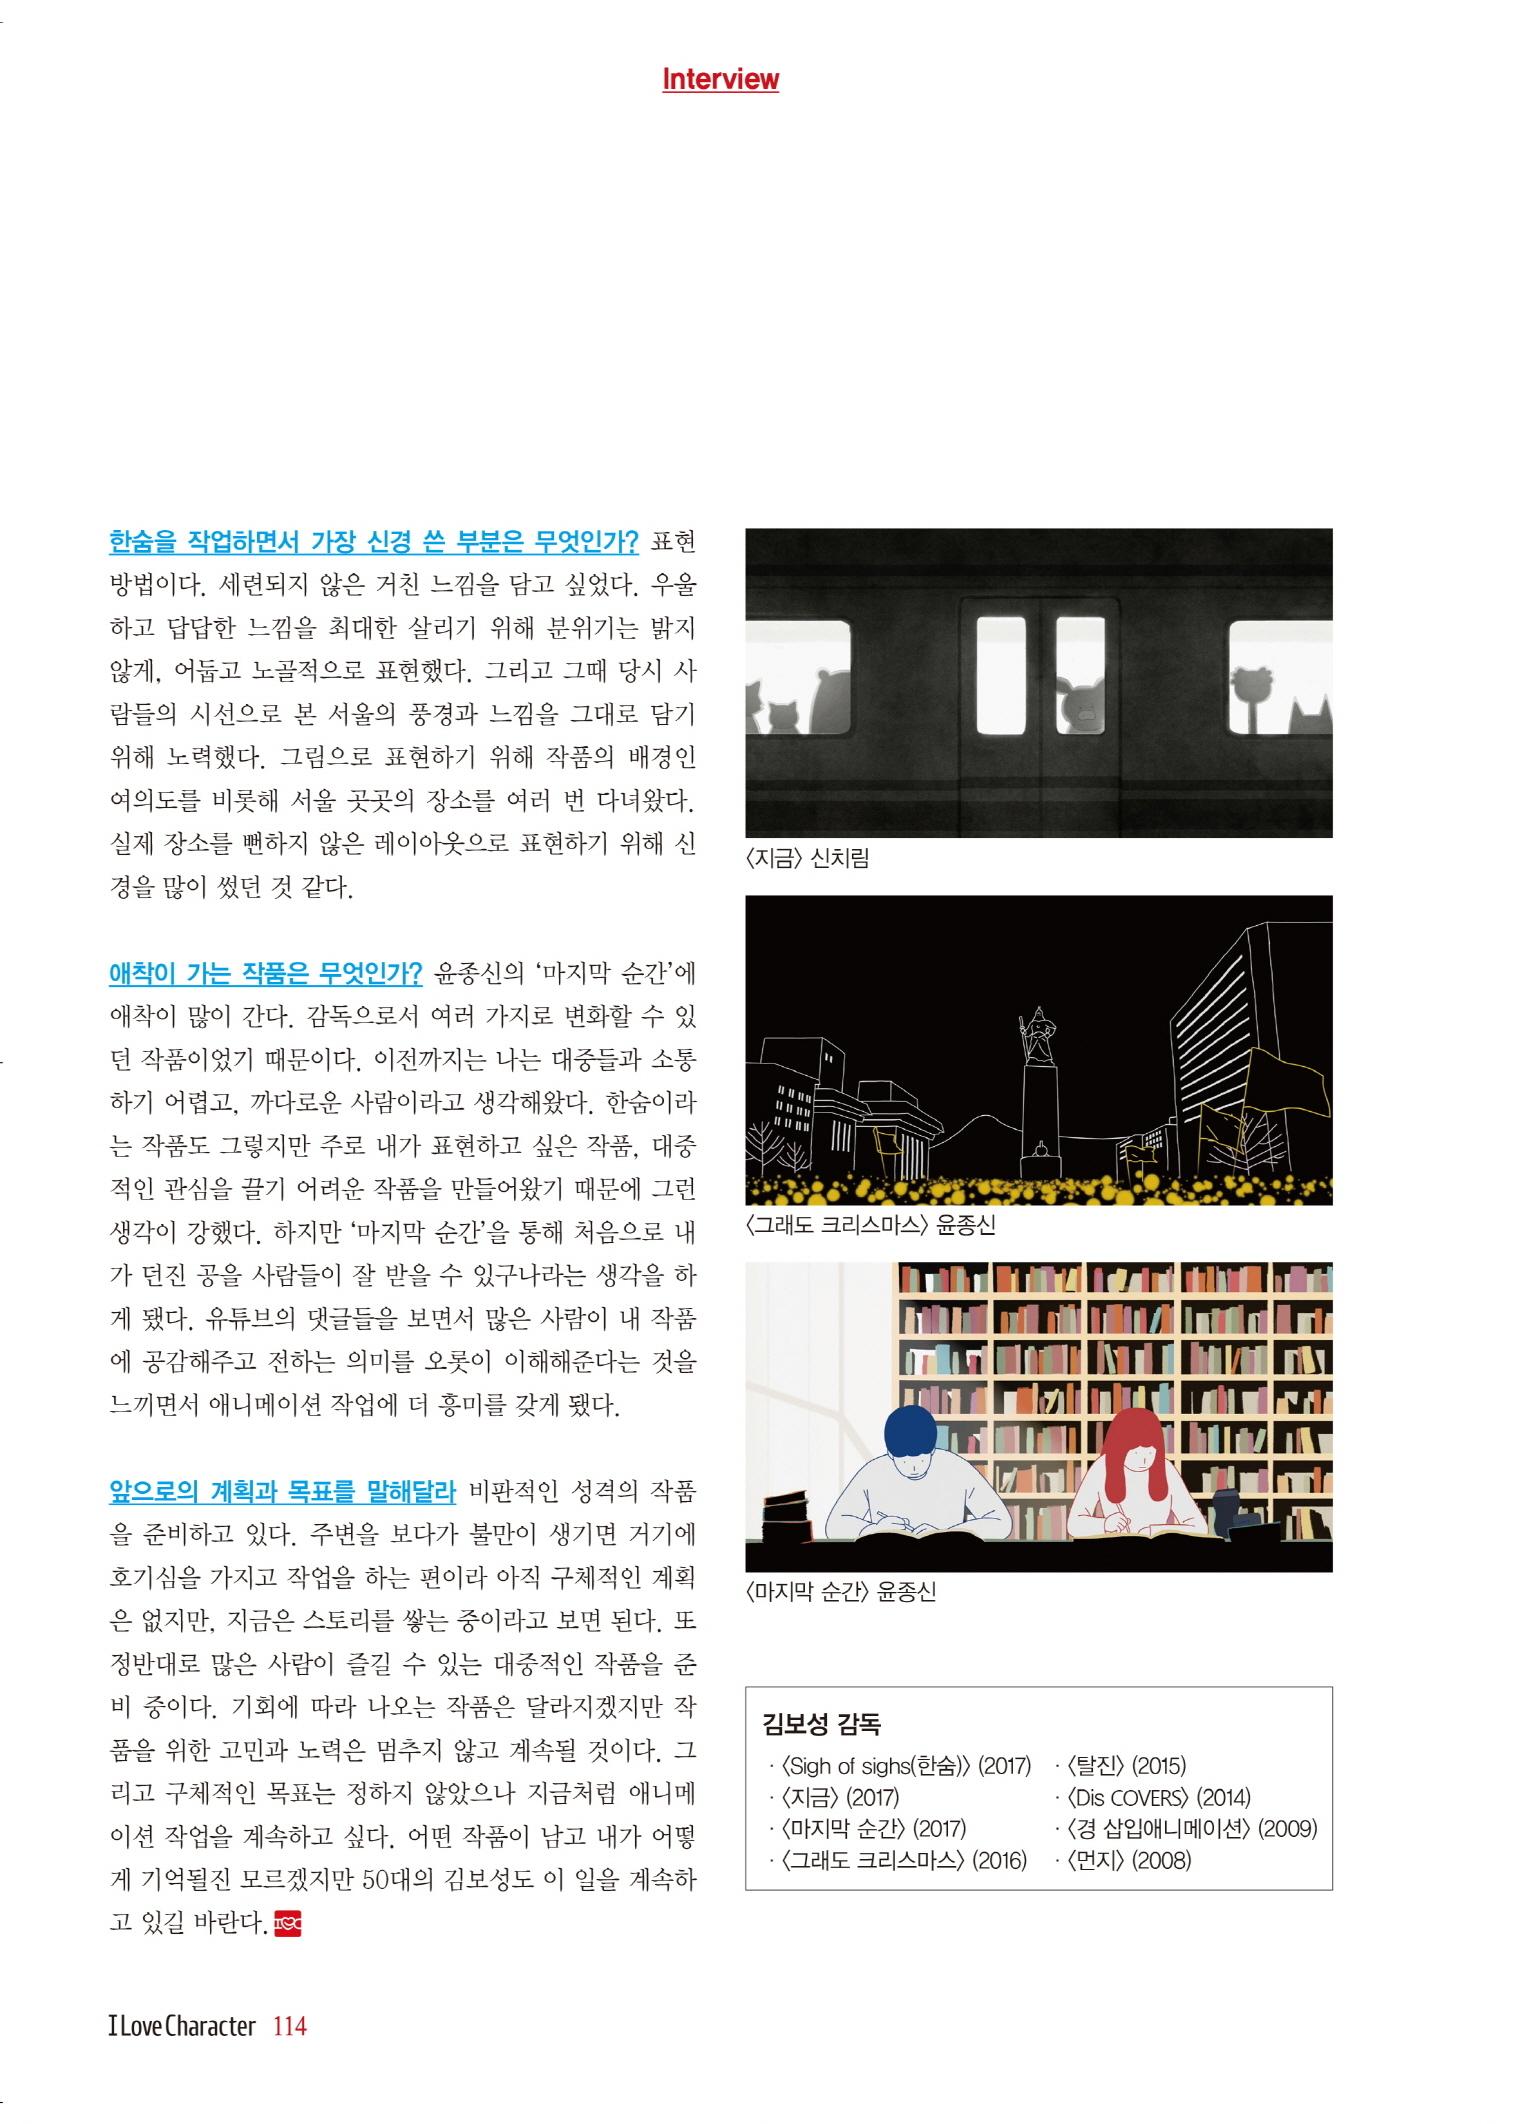 ILC_GIM _Boseong03